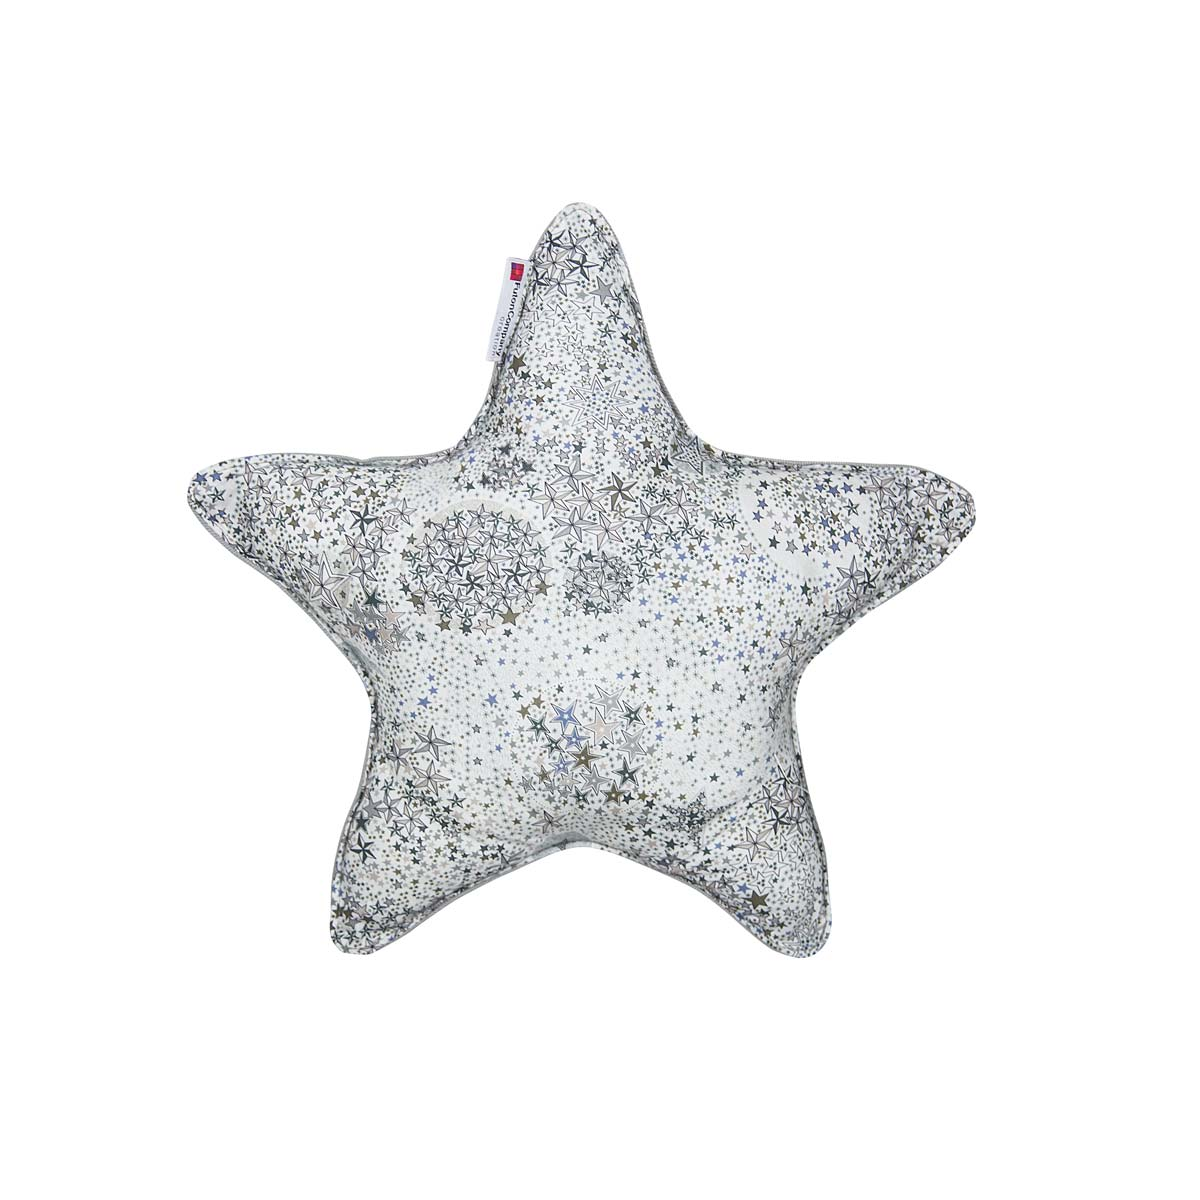 Almofada Star M Tecido Adelajda Estrela 01 F